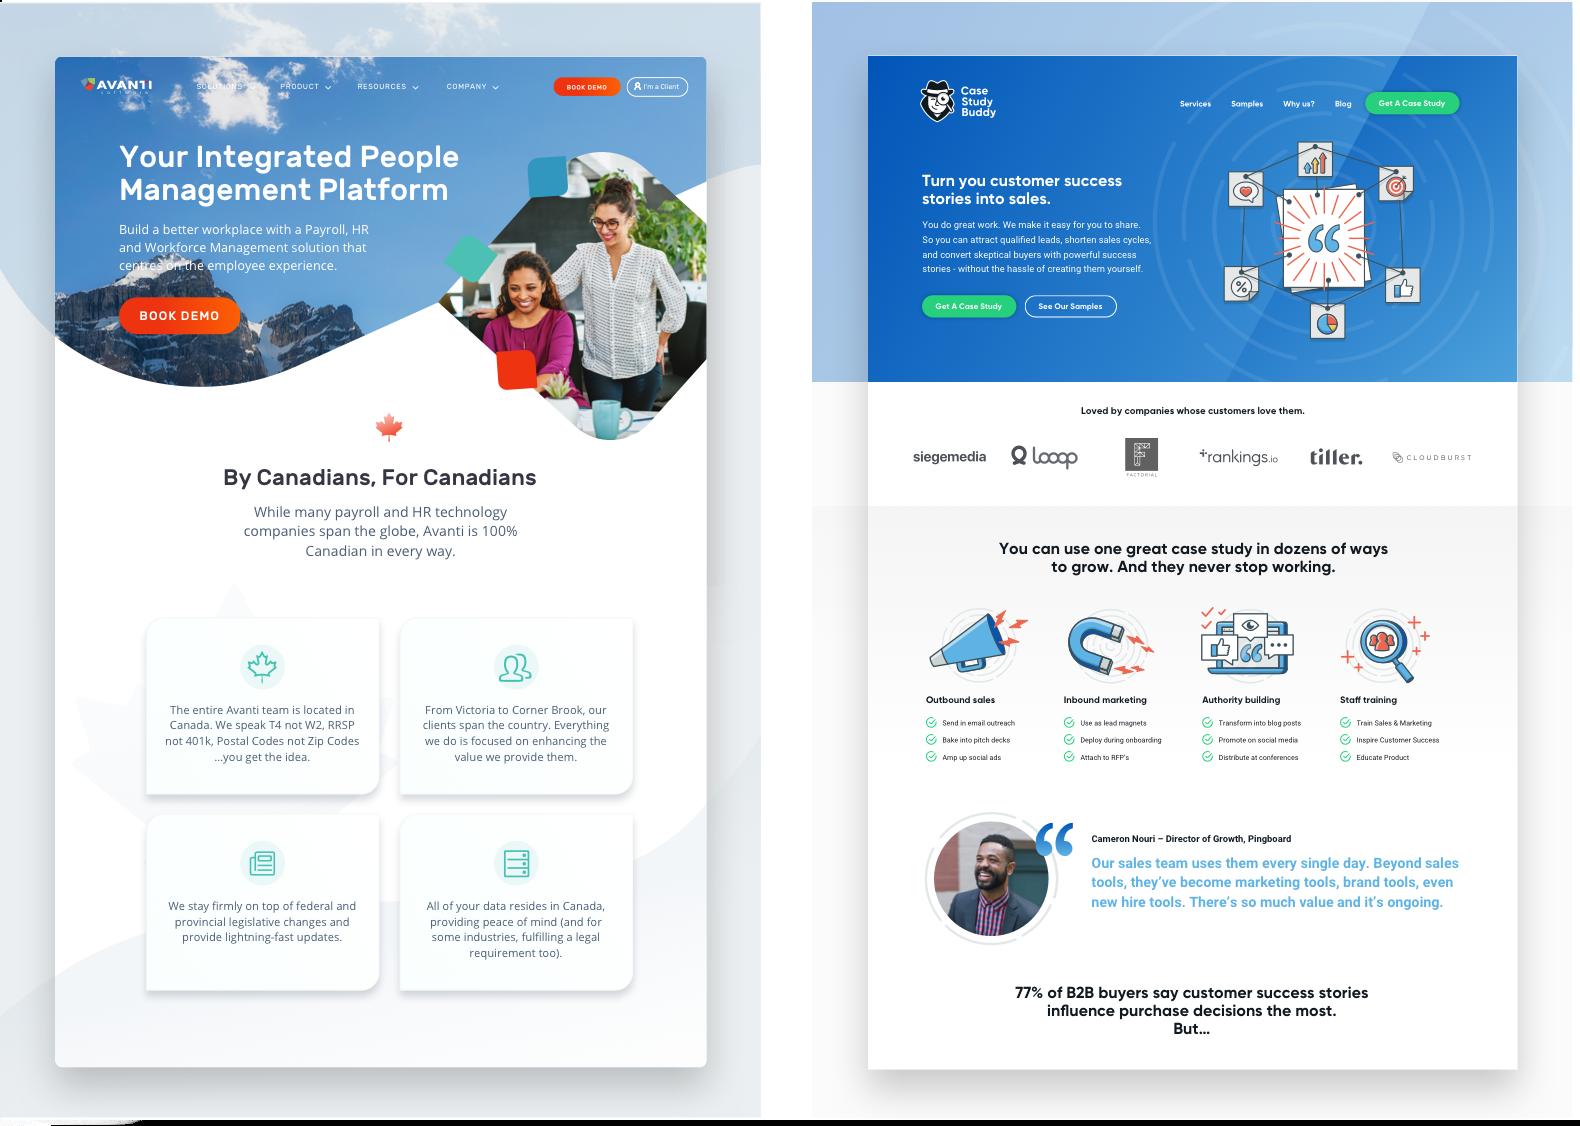 Avanti Software and Case Study Buddy websites - designed by Tiller.